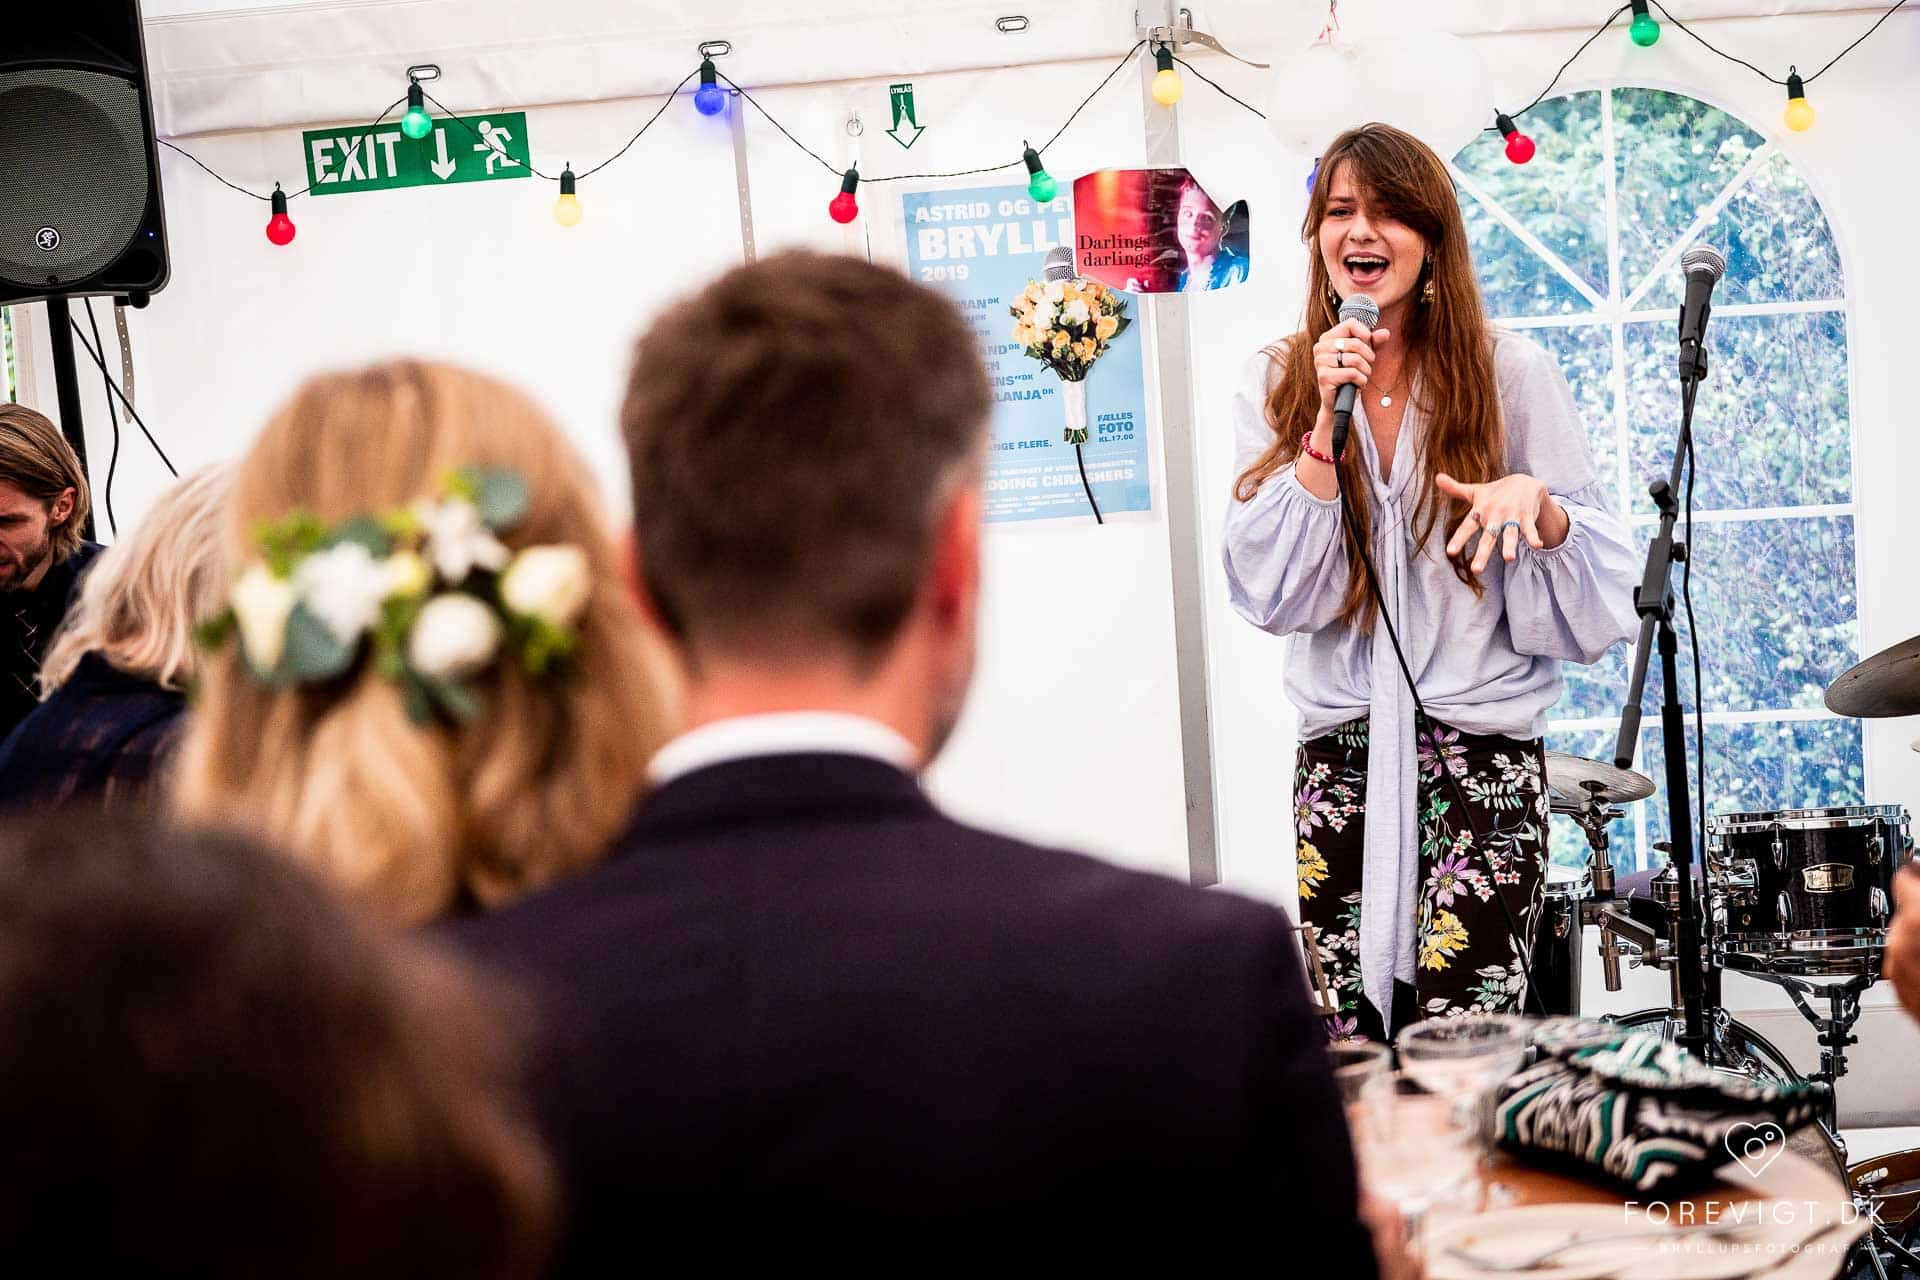 Eksklusive bryllupsomgivelser | Bryllup i Aarhus C